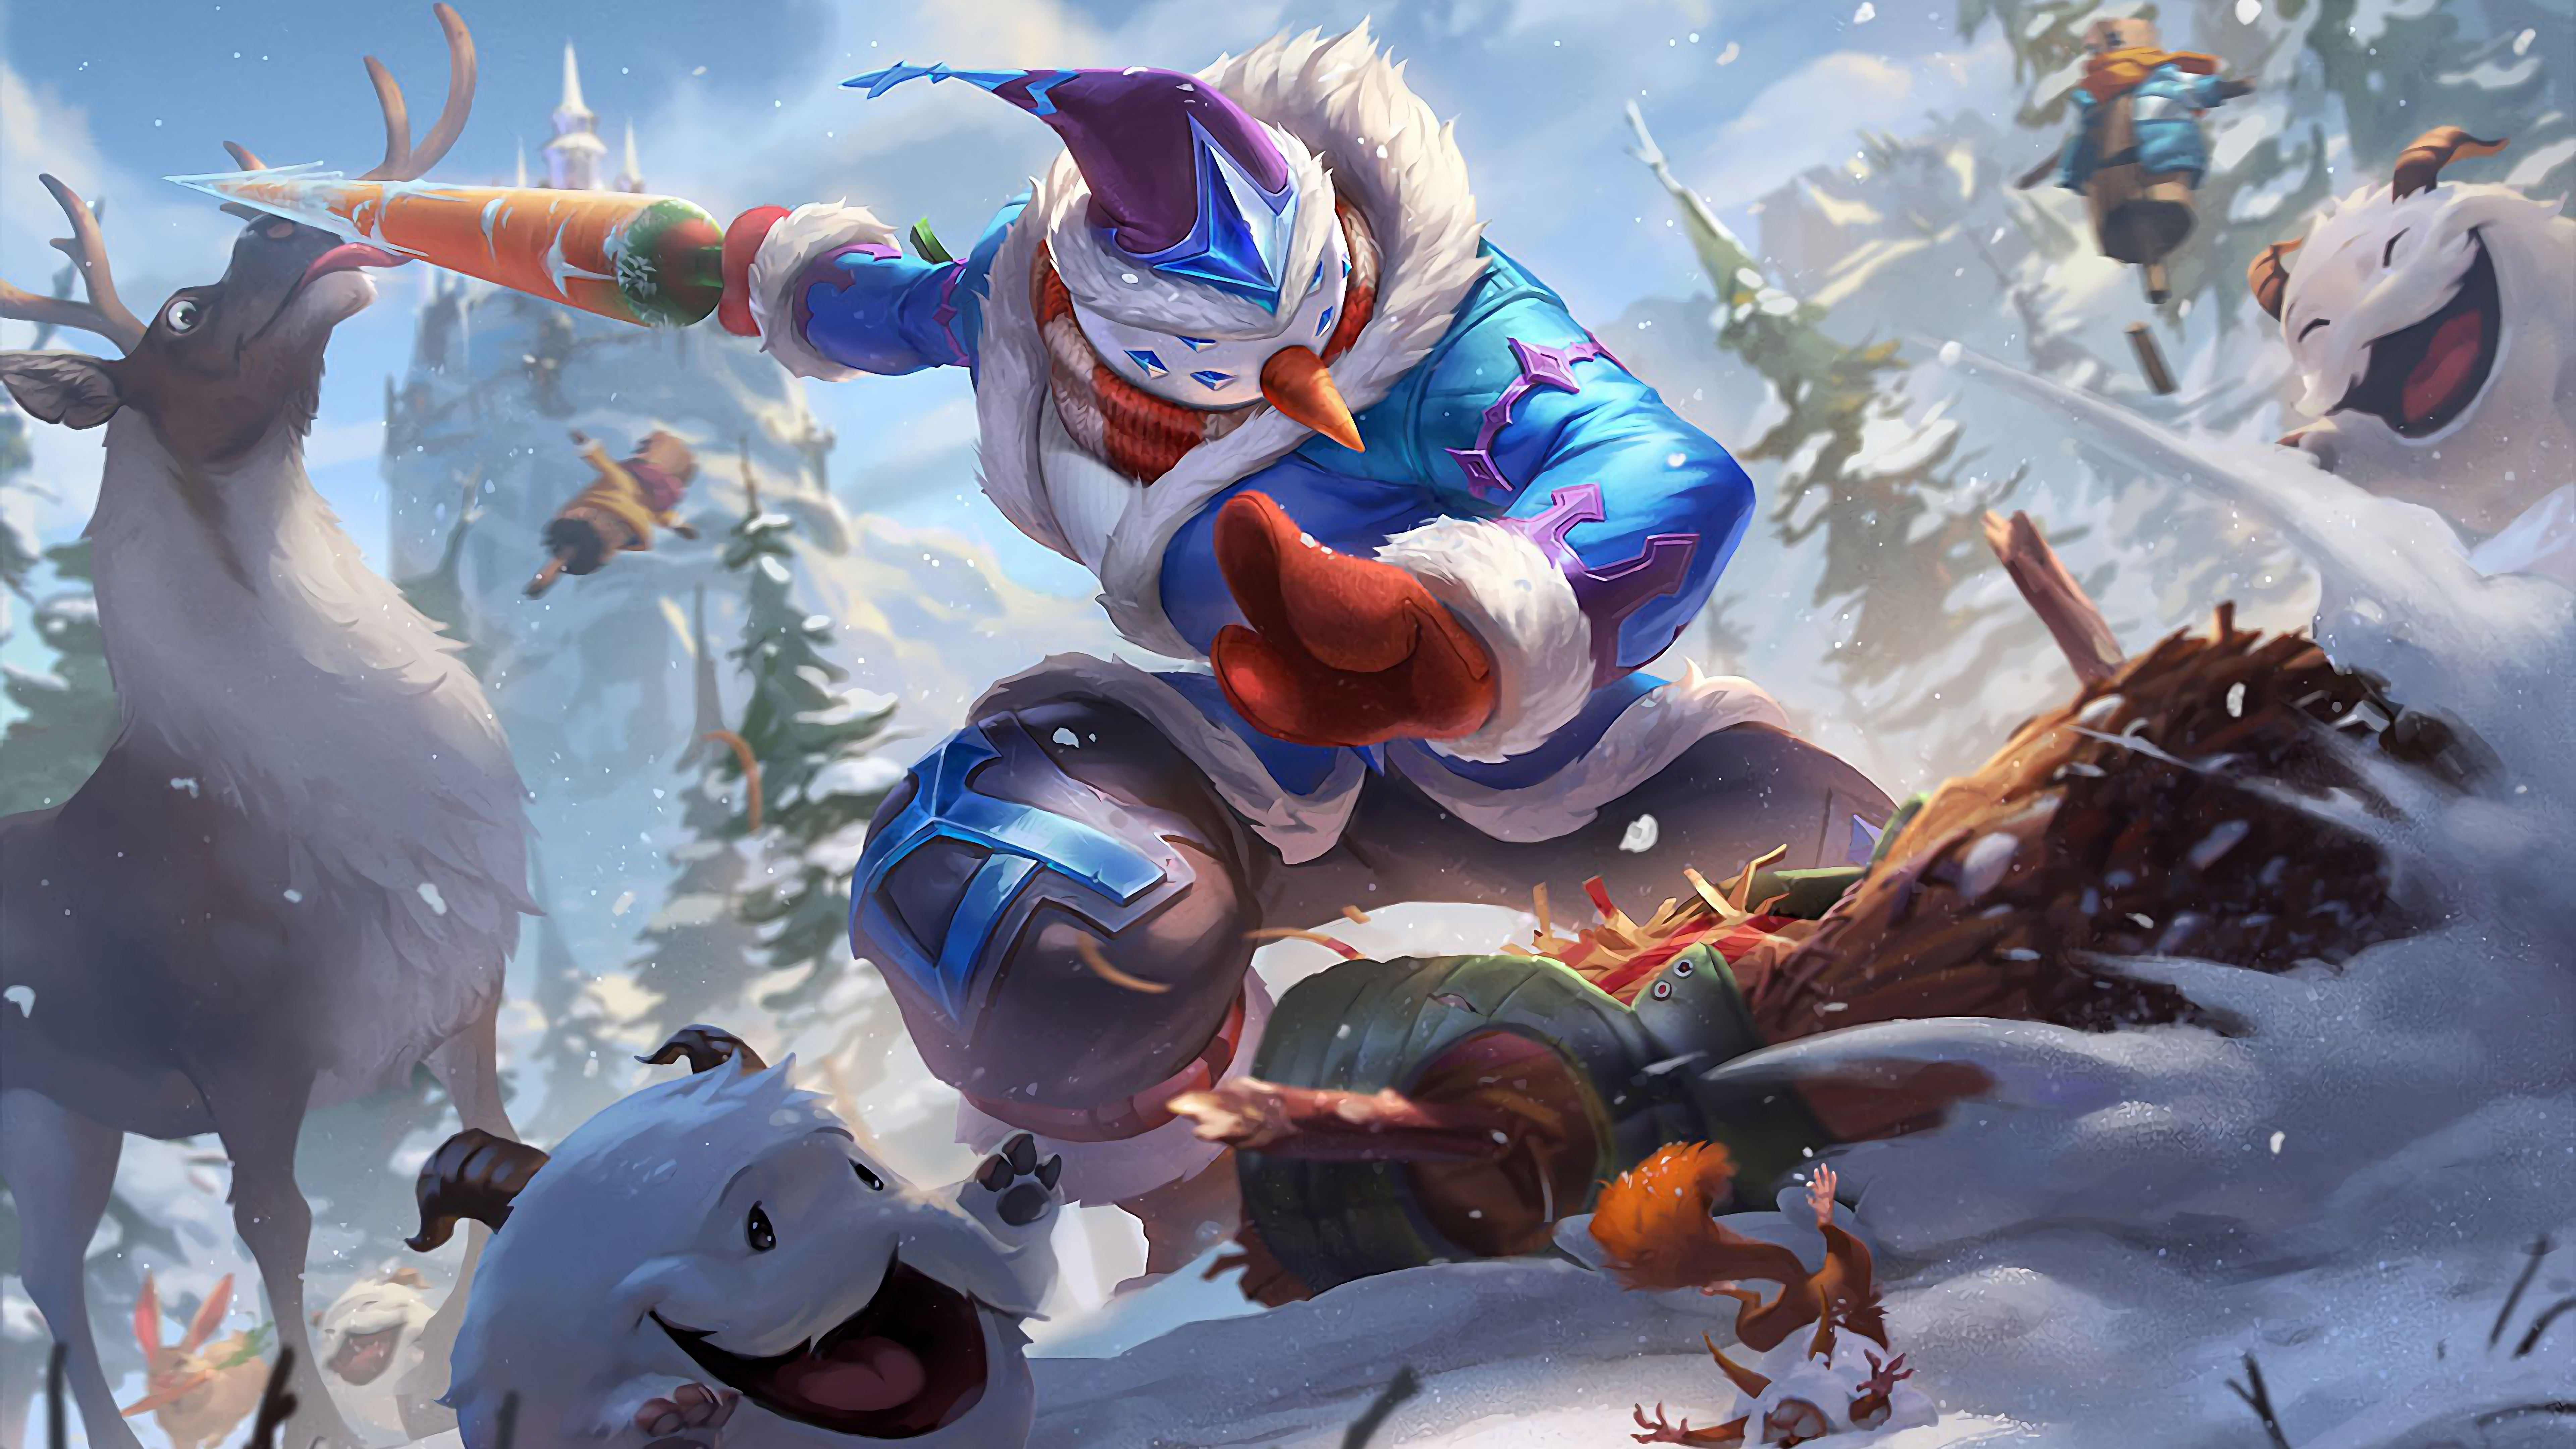 snow man yi lol splash art skin league of legends lol 1574105028 - Snow Man Yi LoL Splash Art Skin League of Legends lol - Snowdown - League of Legends, Master Yi, league of legends